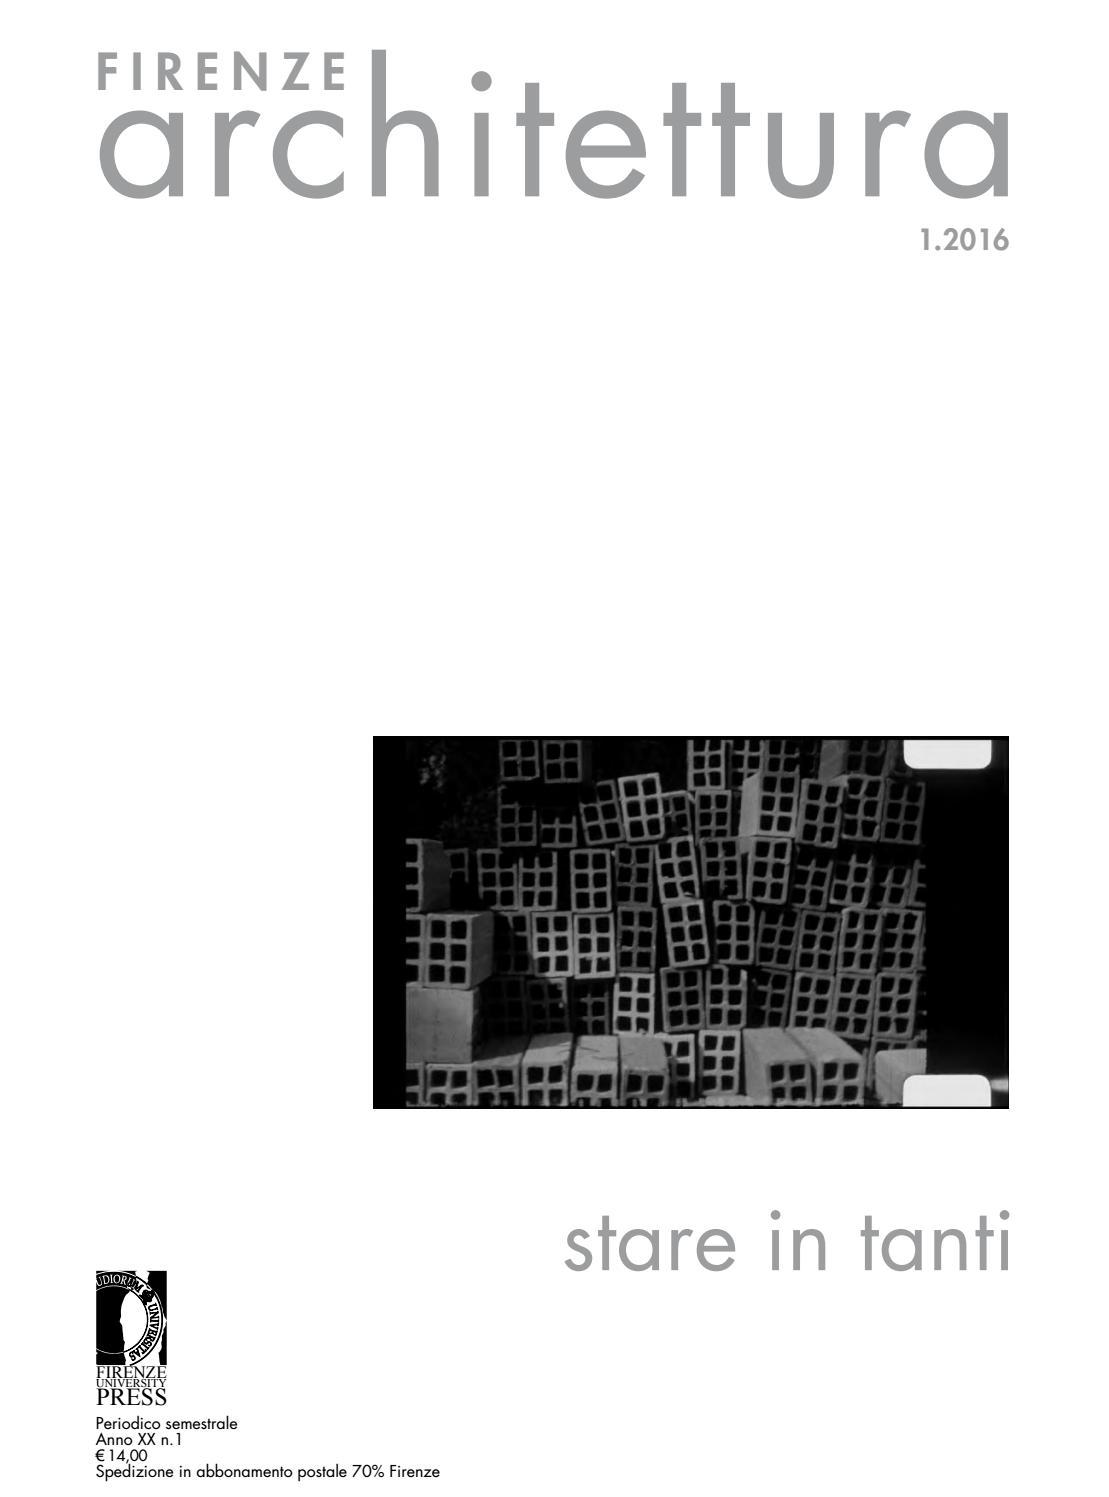 Firenze architettura 2016 1 by dida issuu